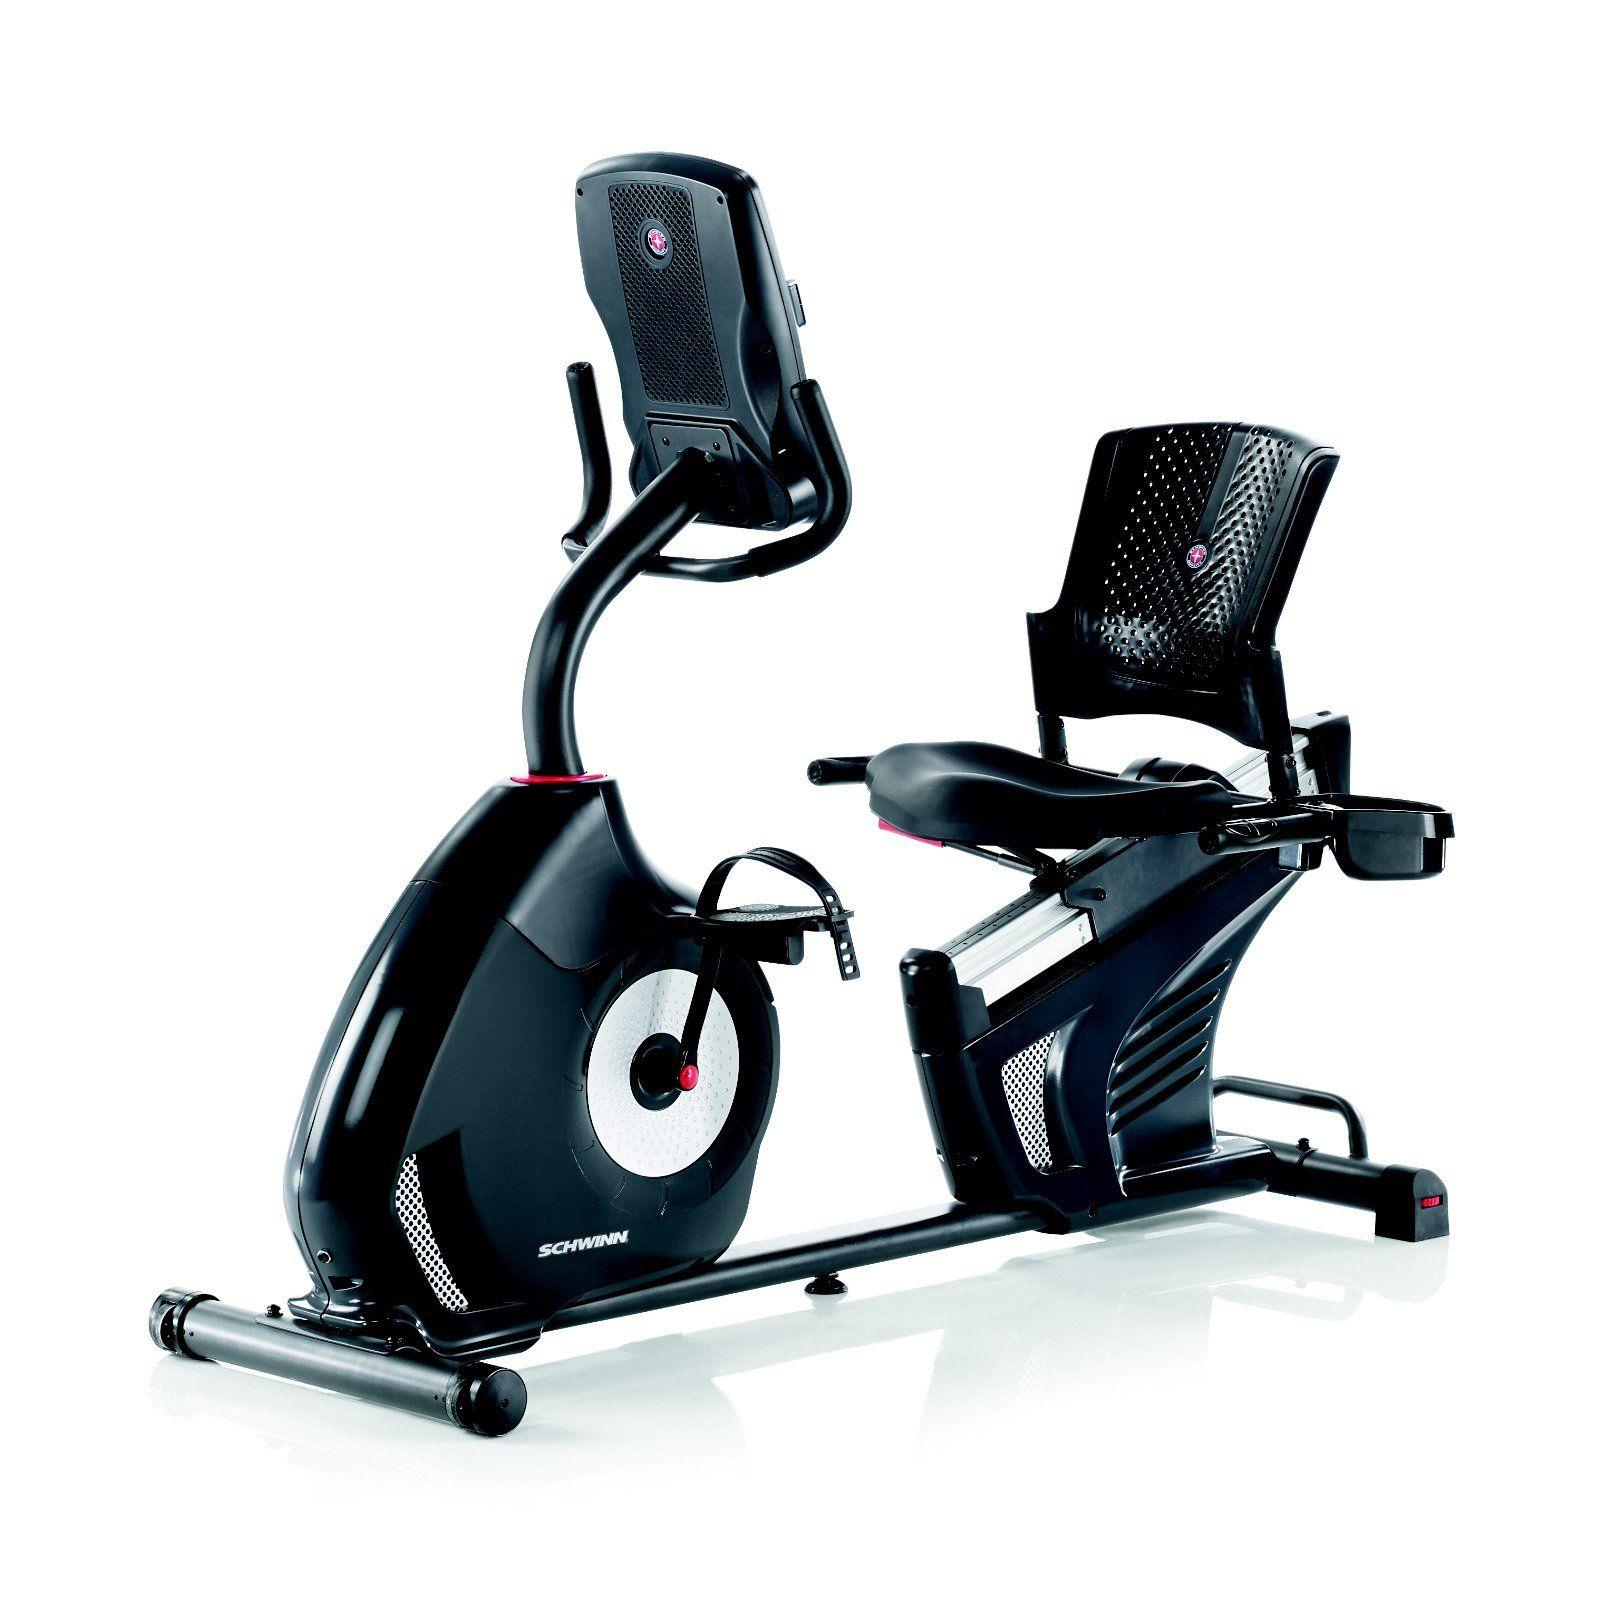 Schwinn 270 Recumbent Exercise Bike From Hayneedle Com Recumbent Bike Workout Exercise Bike Reviews Best Exercise Bike